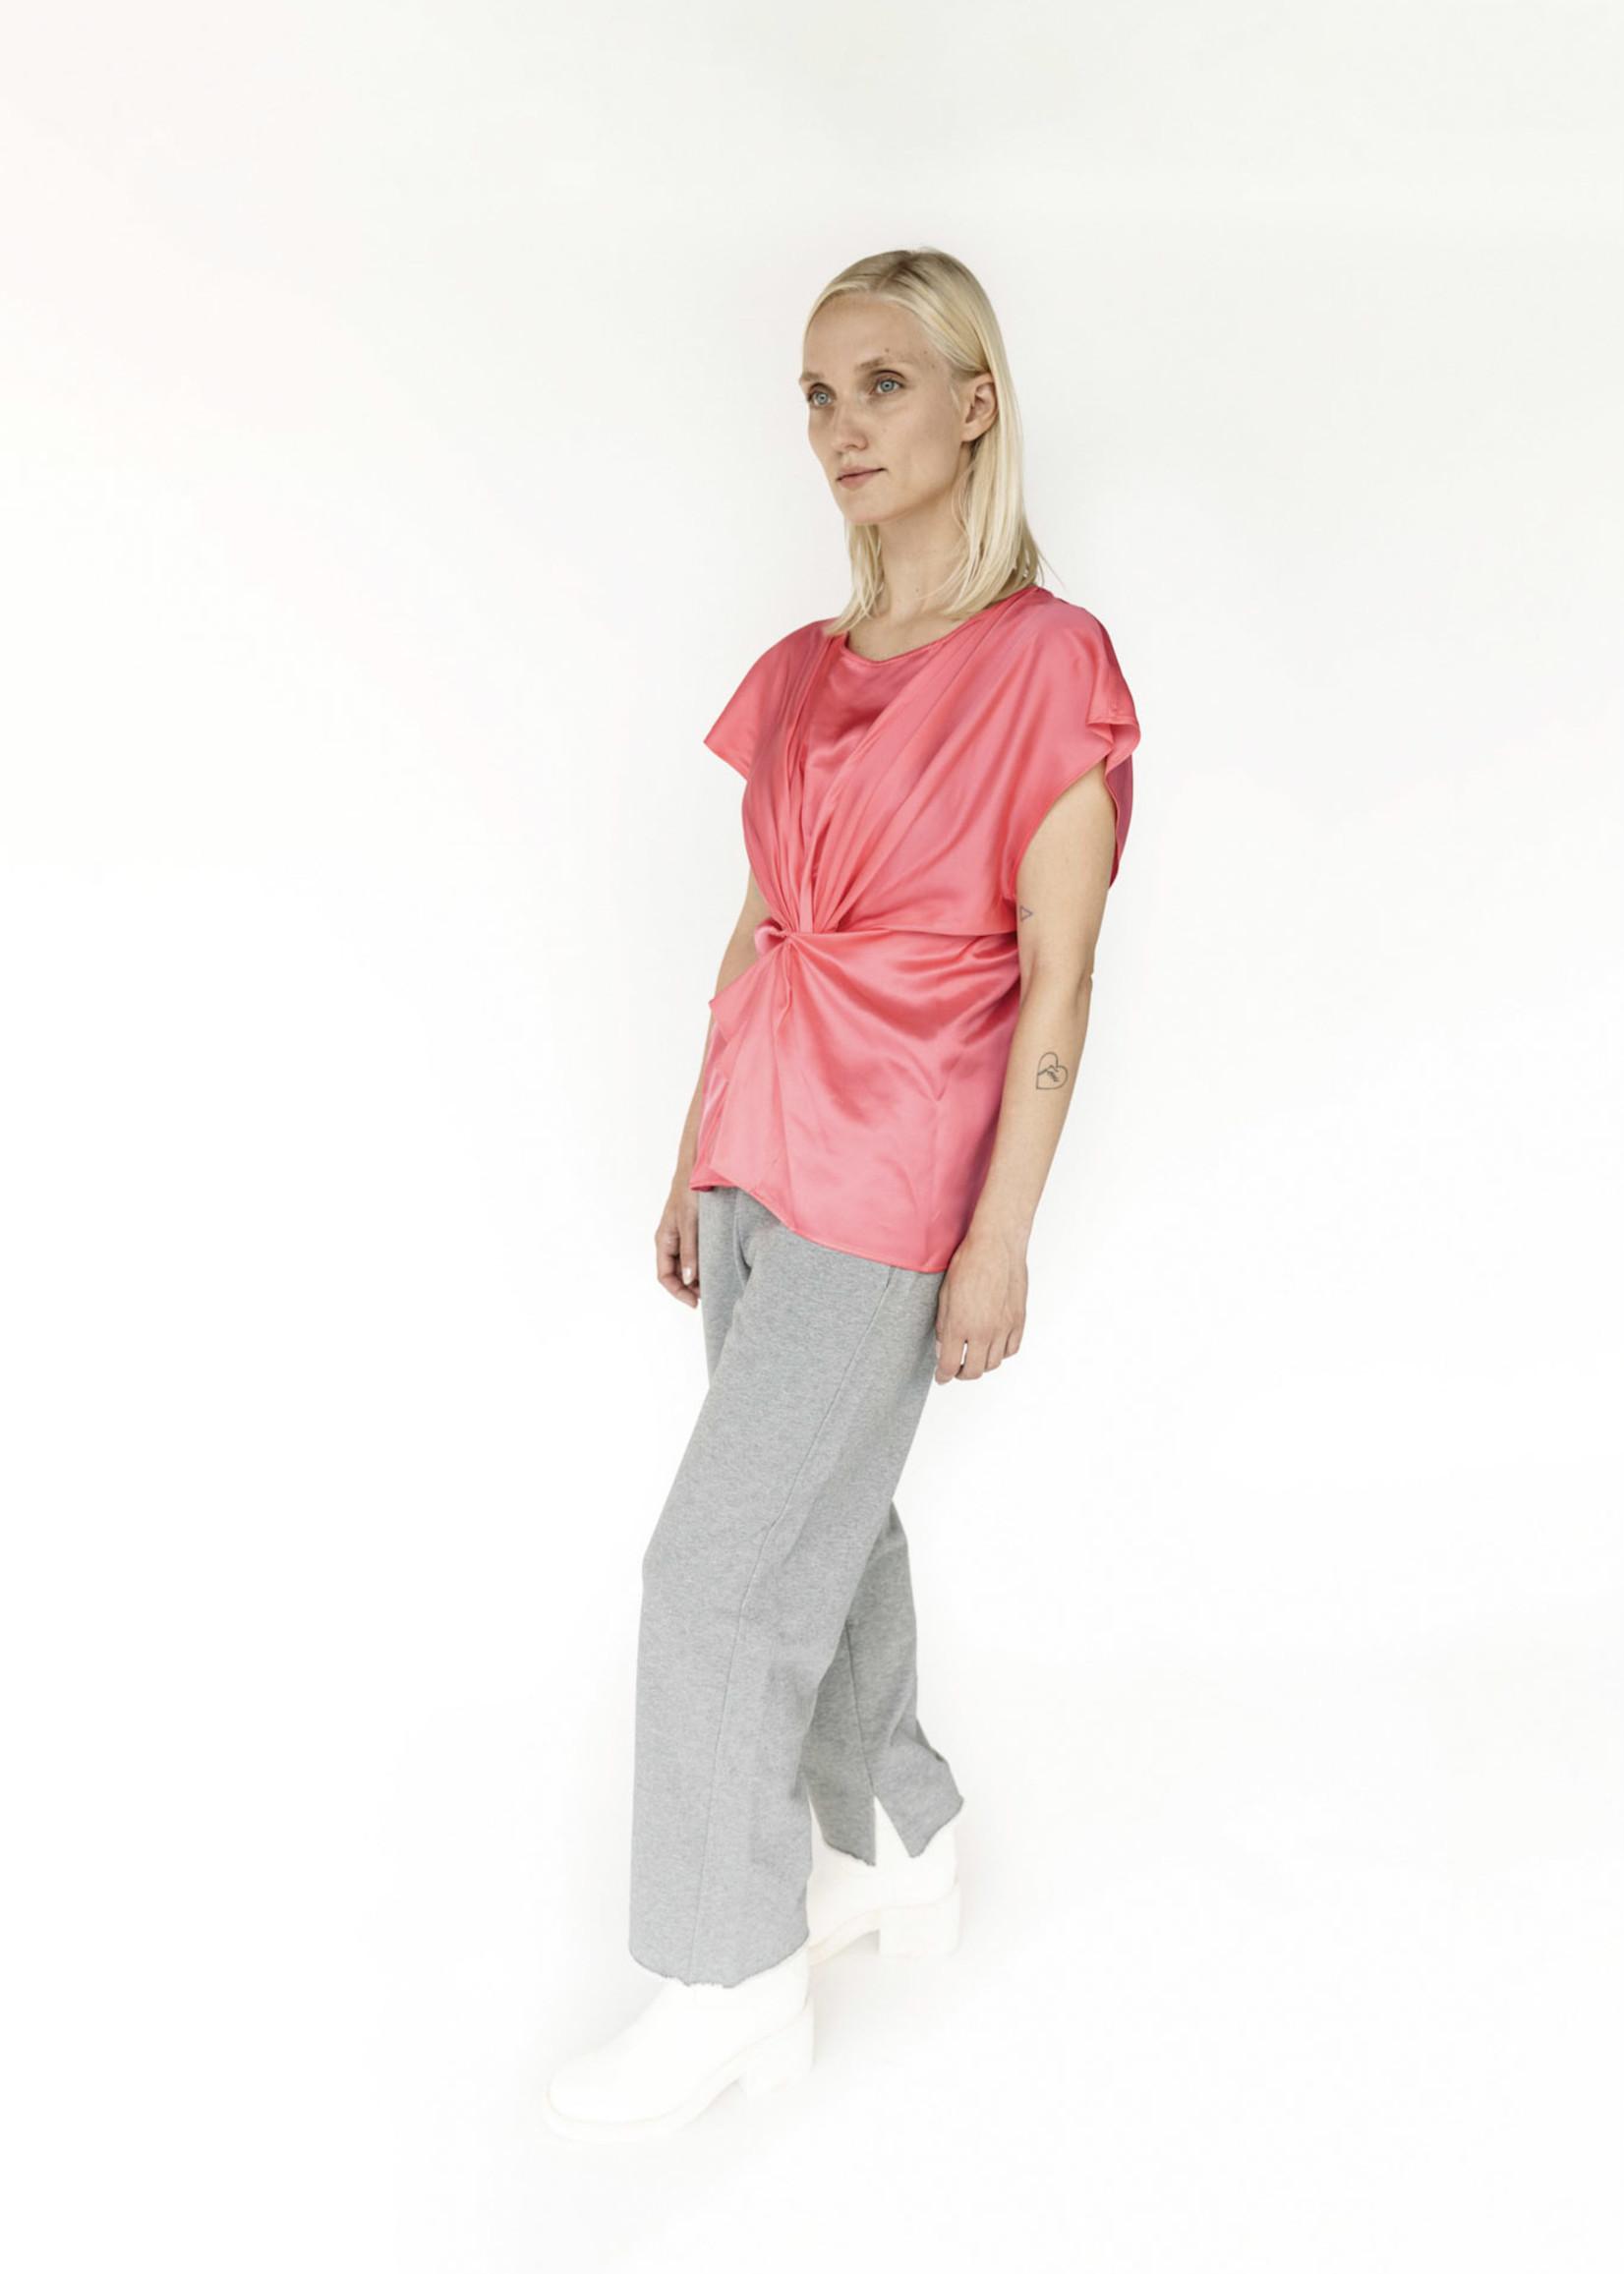 MM6 MAISON MARGIELA Heather Grey Logo Sweatpants